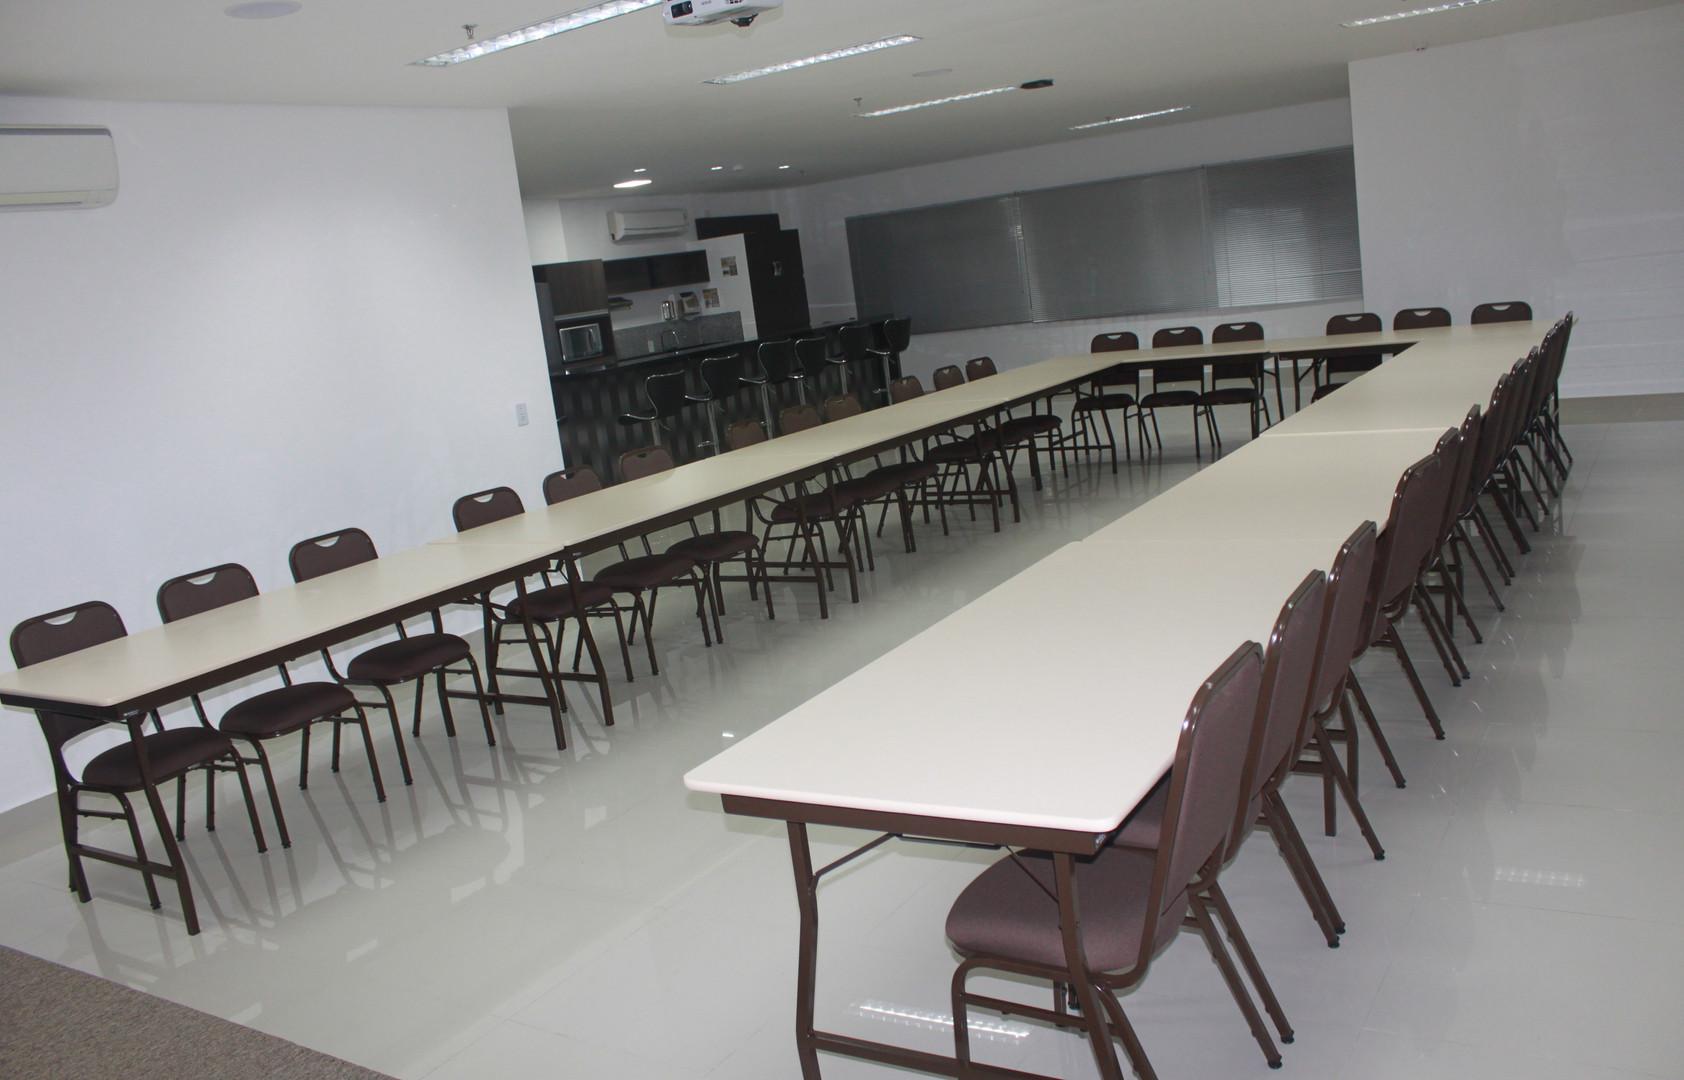 Mezanino (65 pessoas) / Mezzanine (65 people)